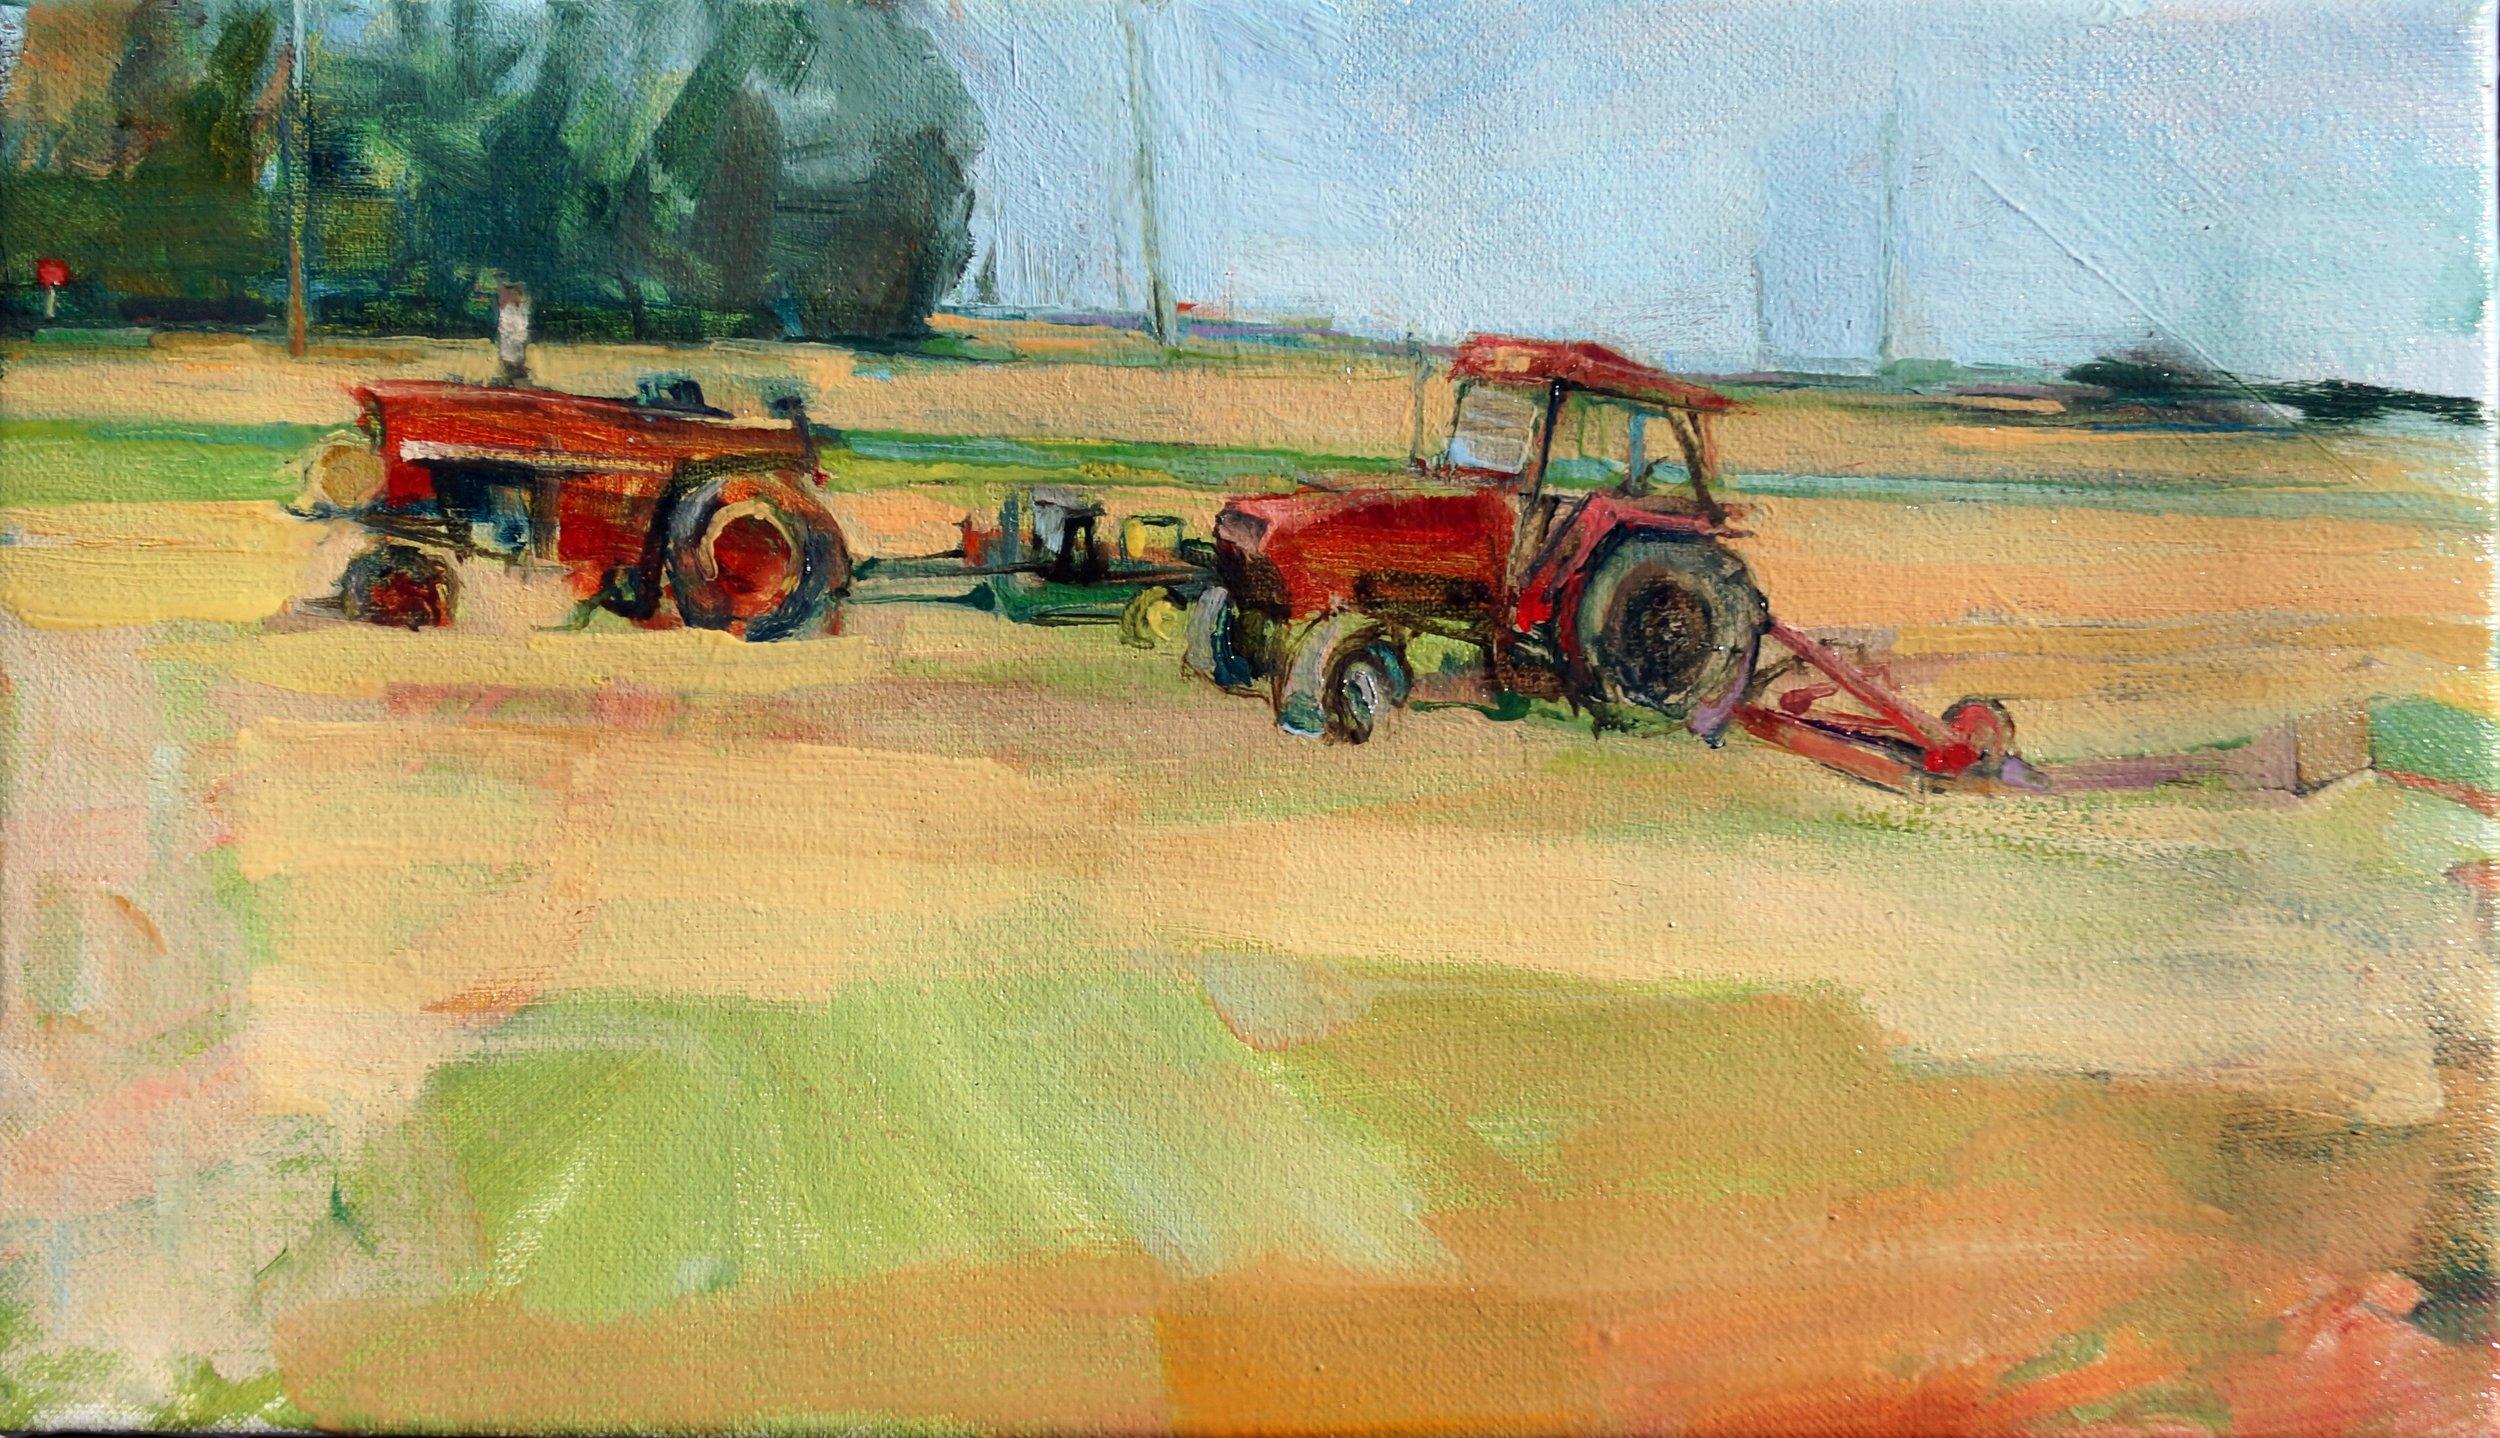 Tractors & Wind. 8 x 14